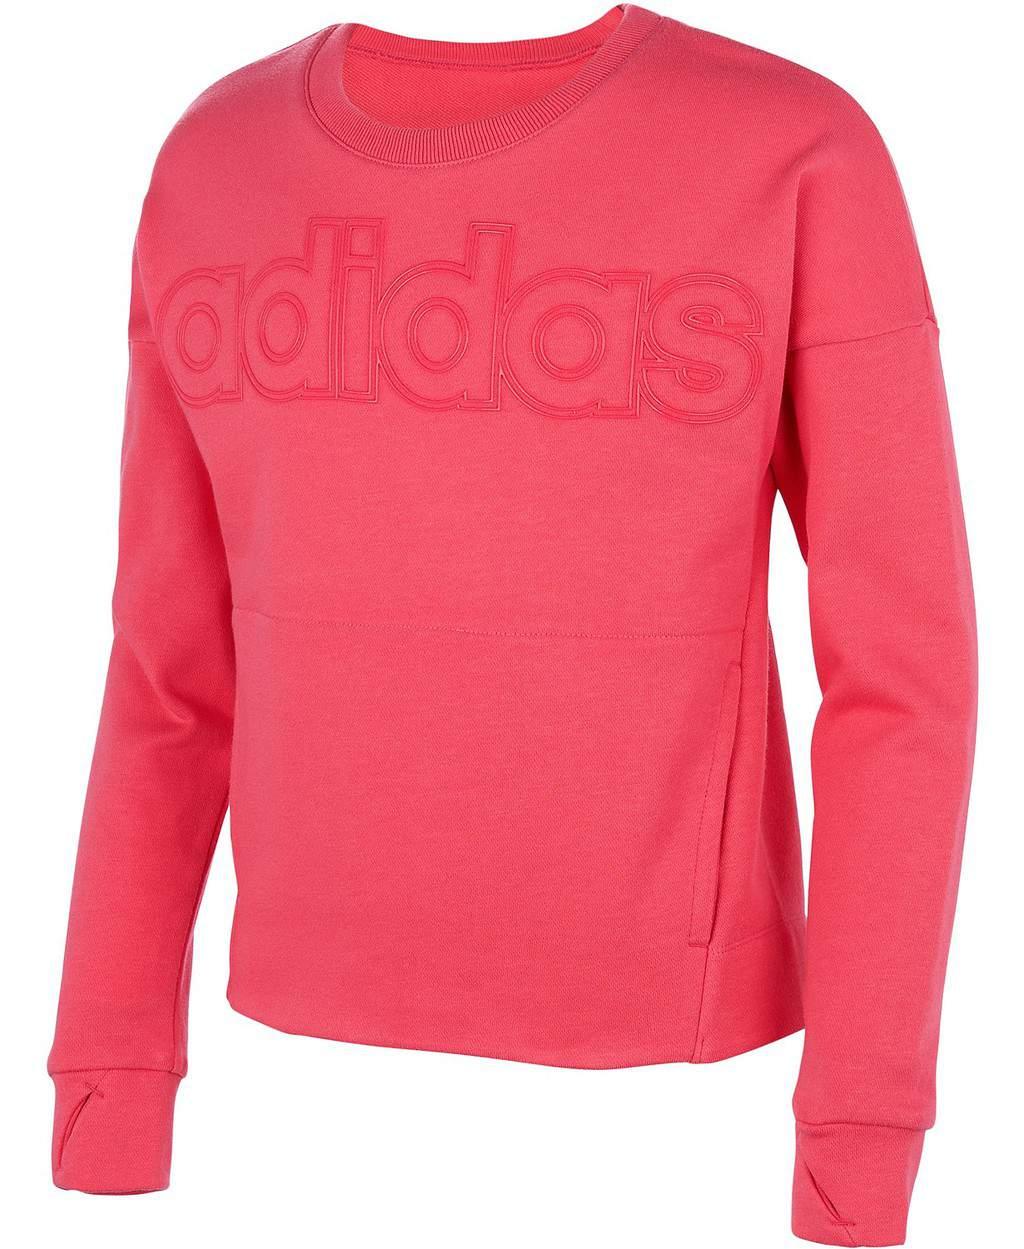 Adidas kids clothing sale